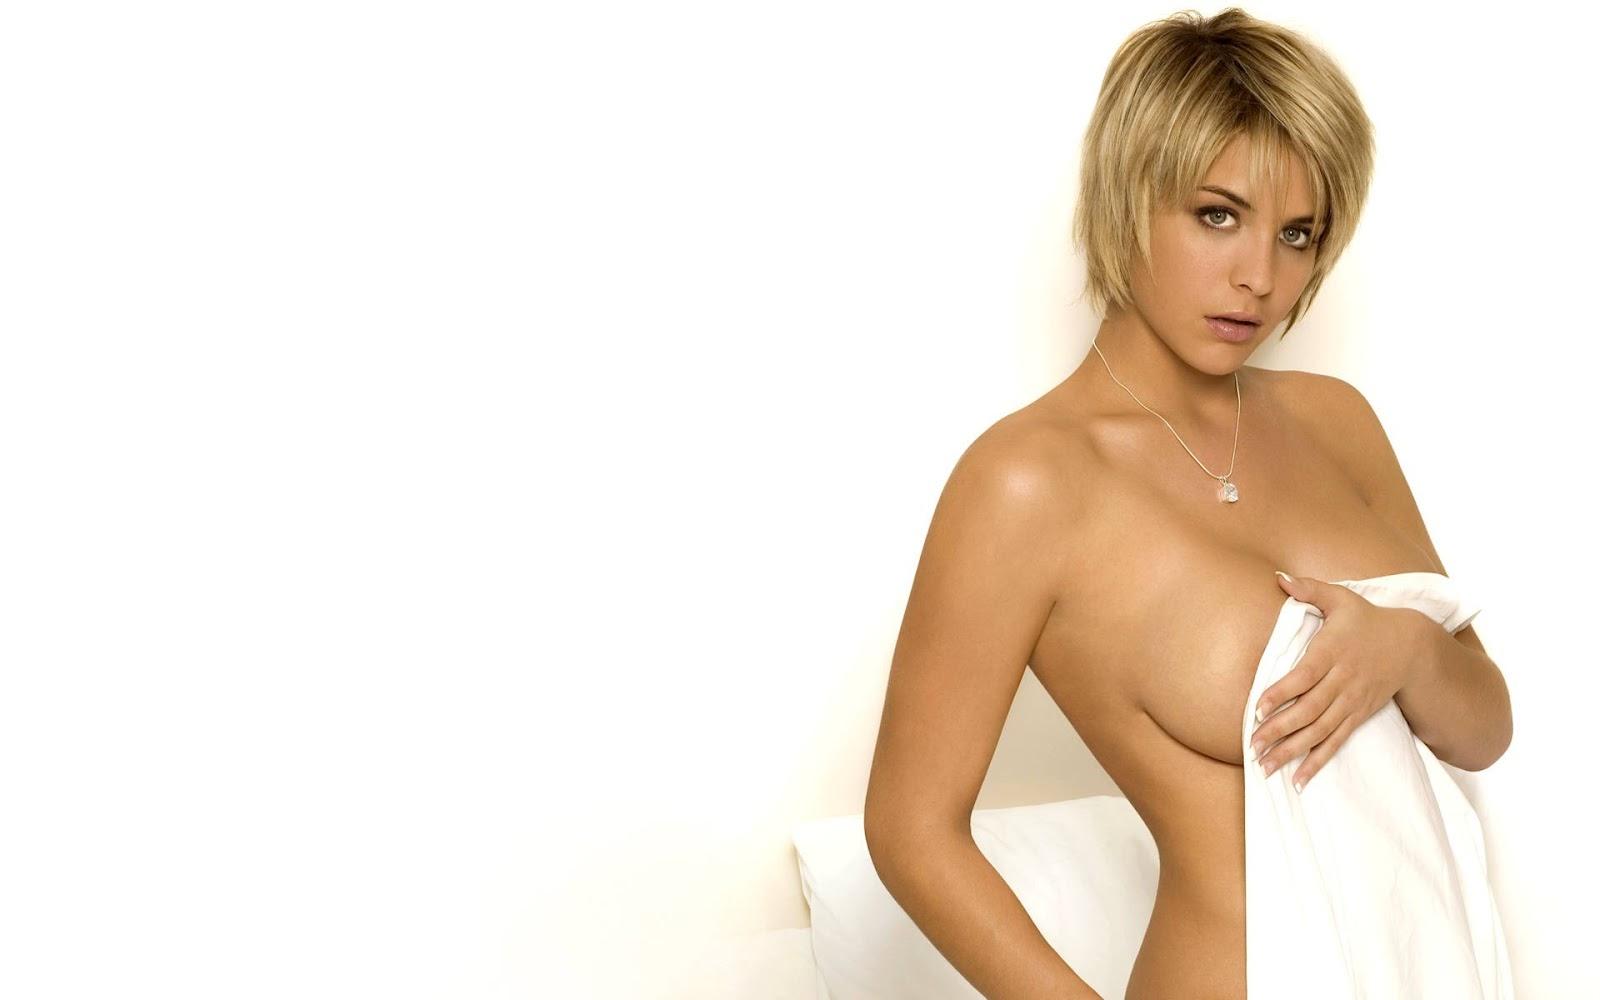 breastes wallpaper